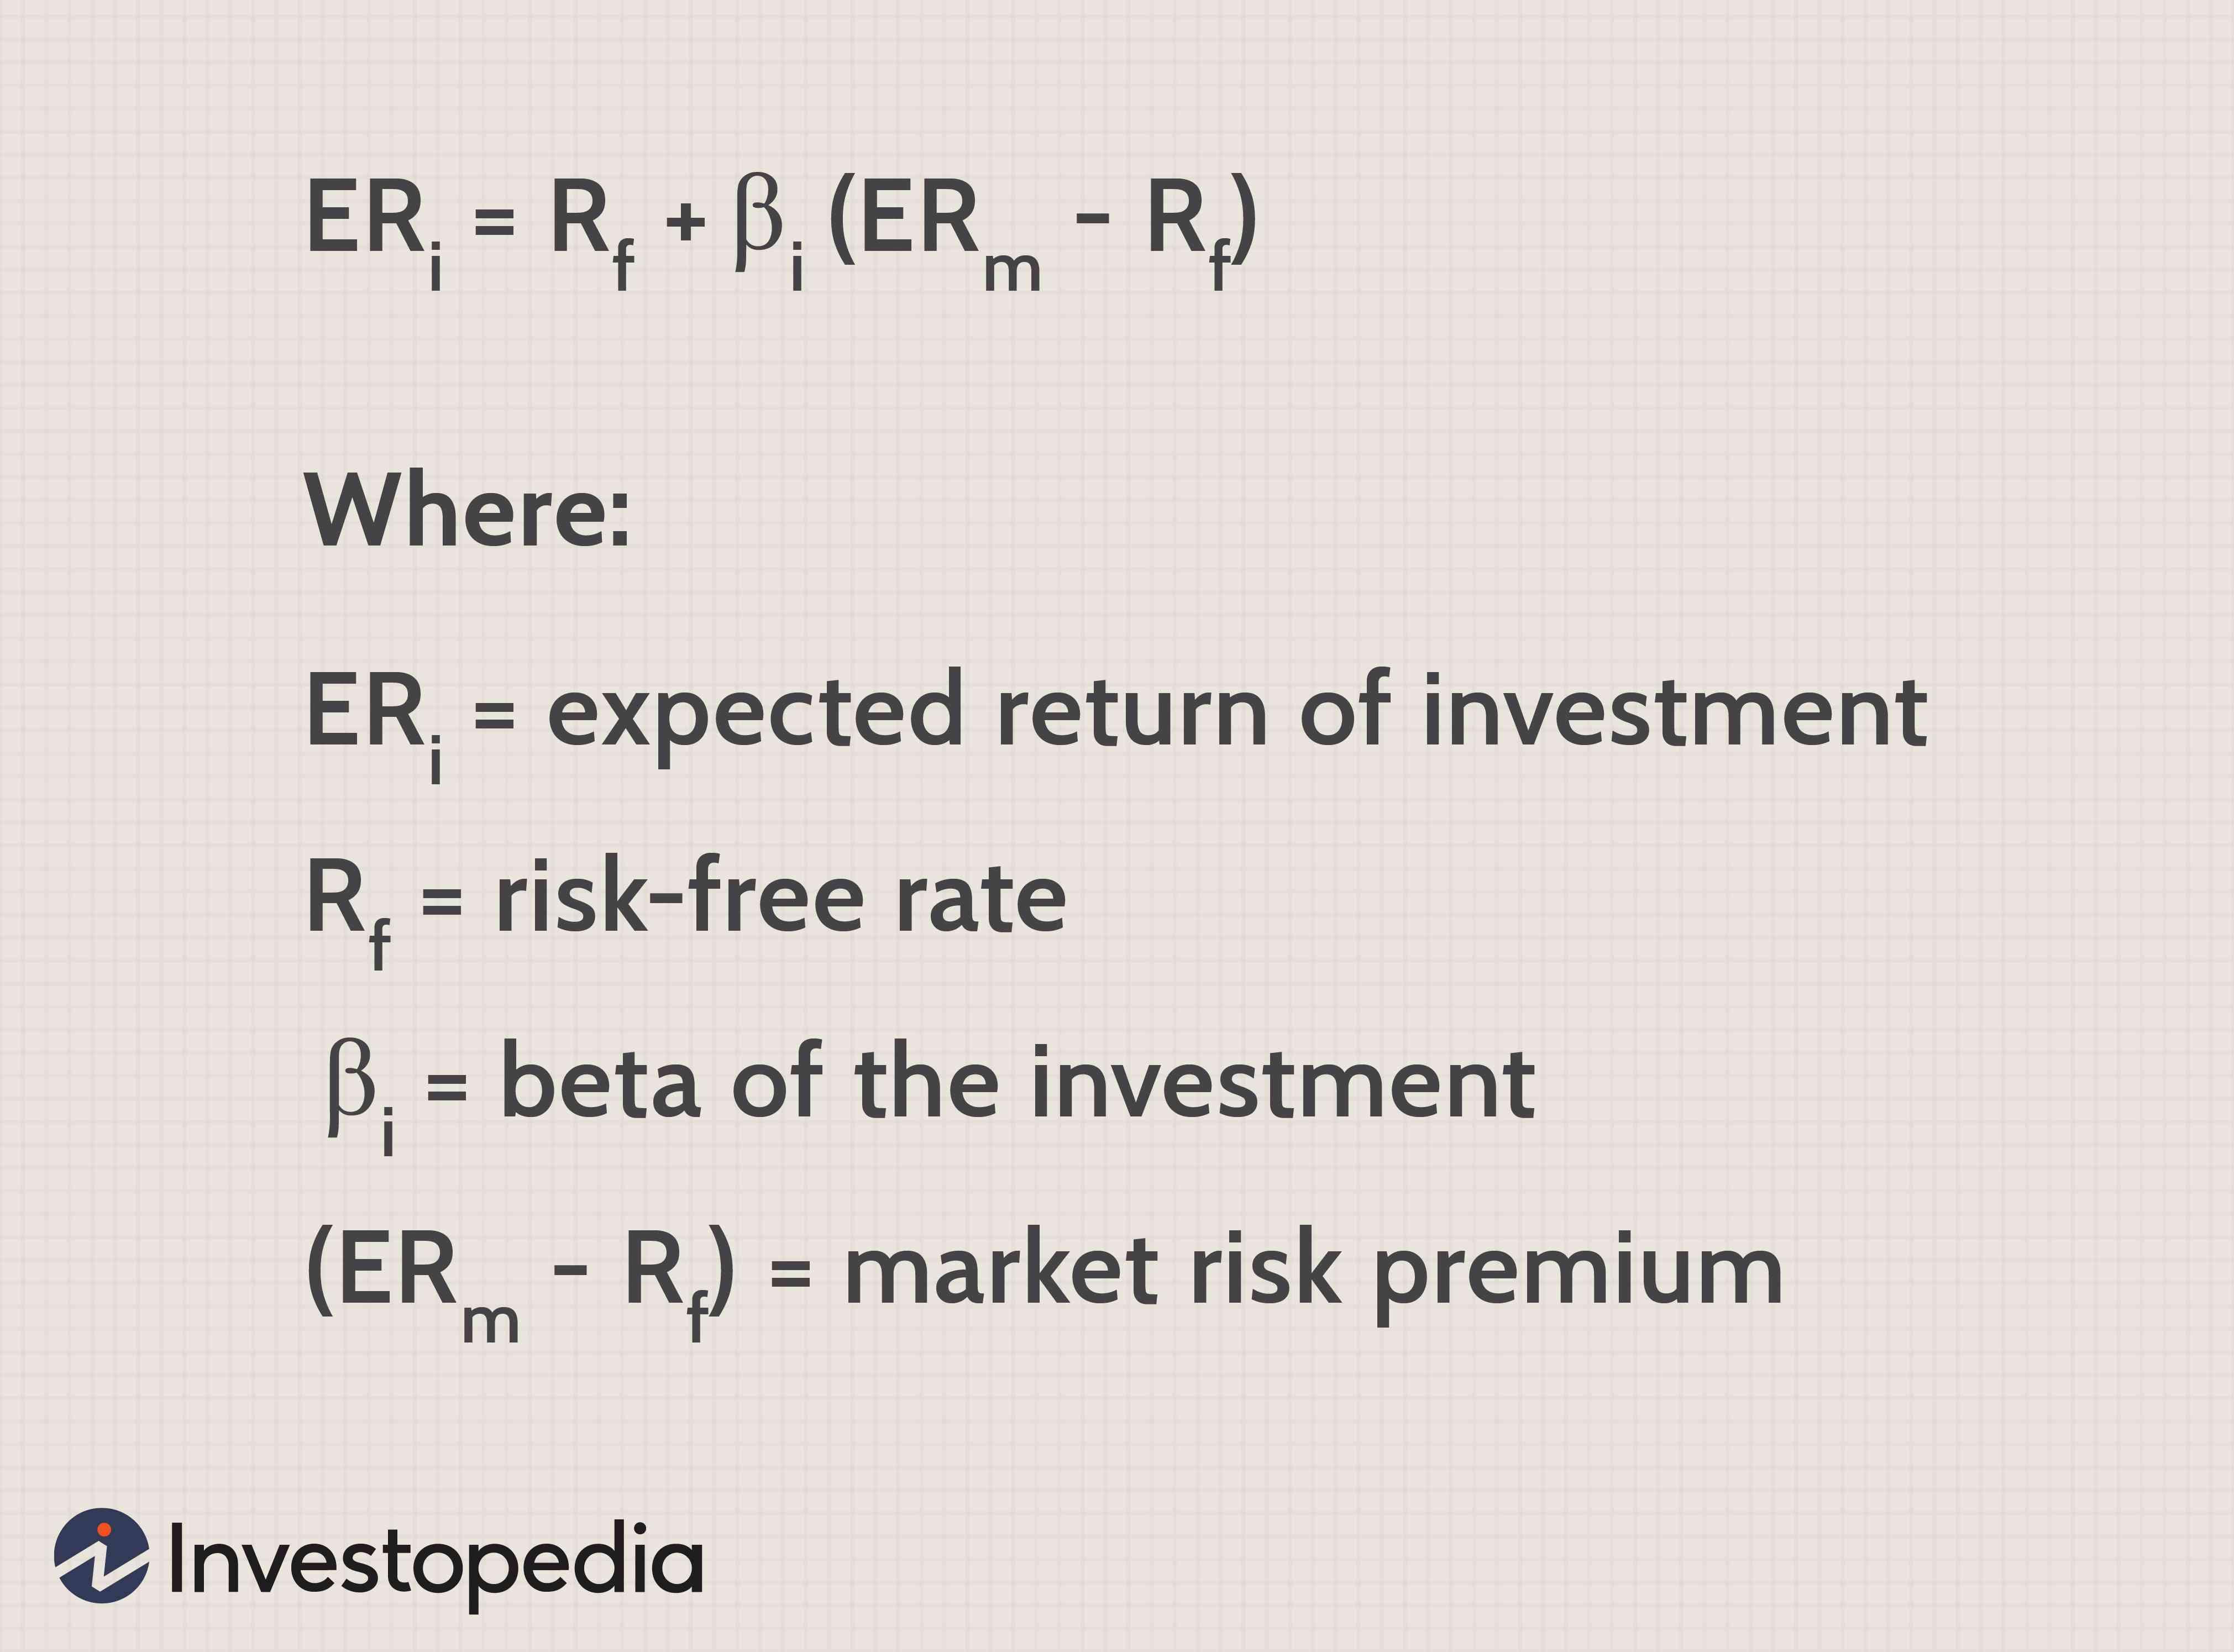 Investopedia model single index 1: A